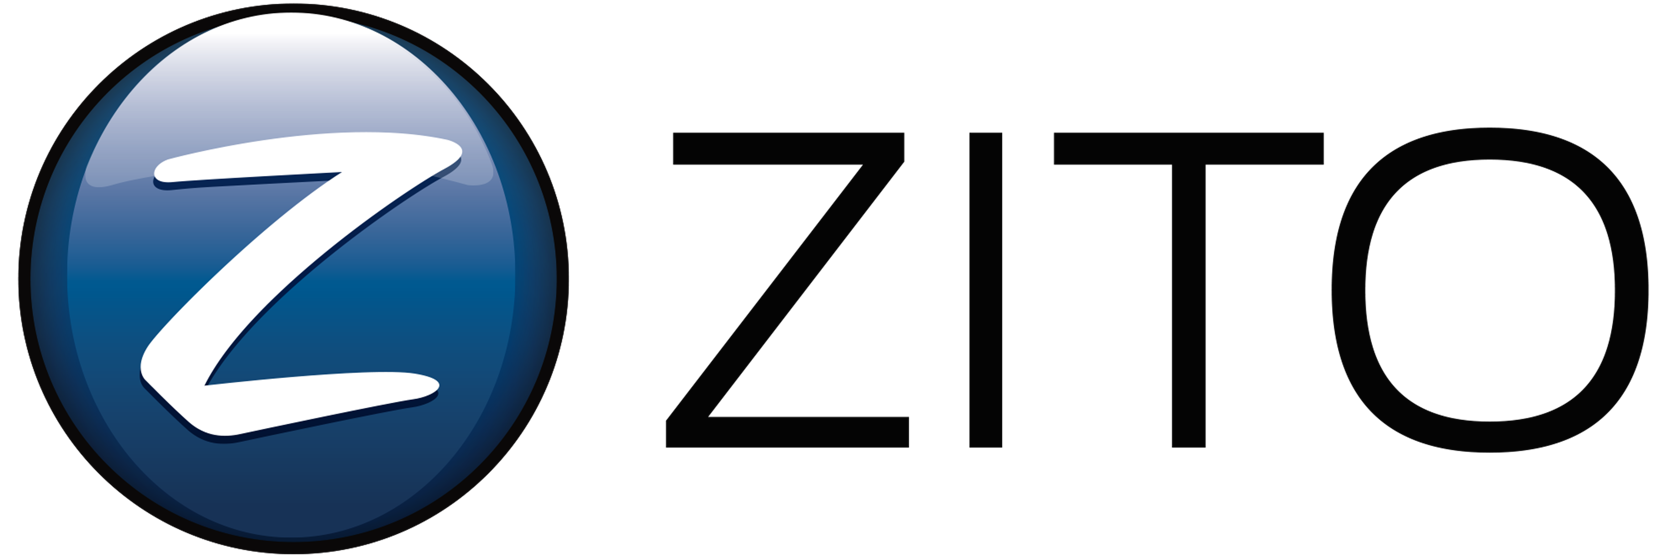 zitomedia net email